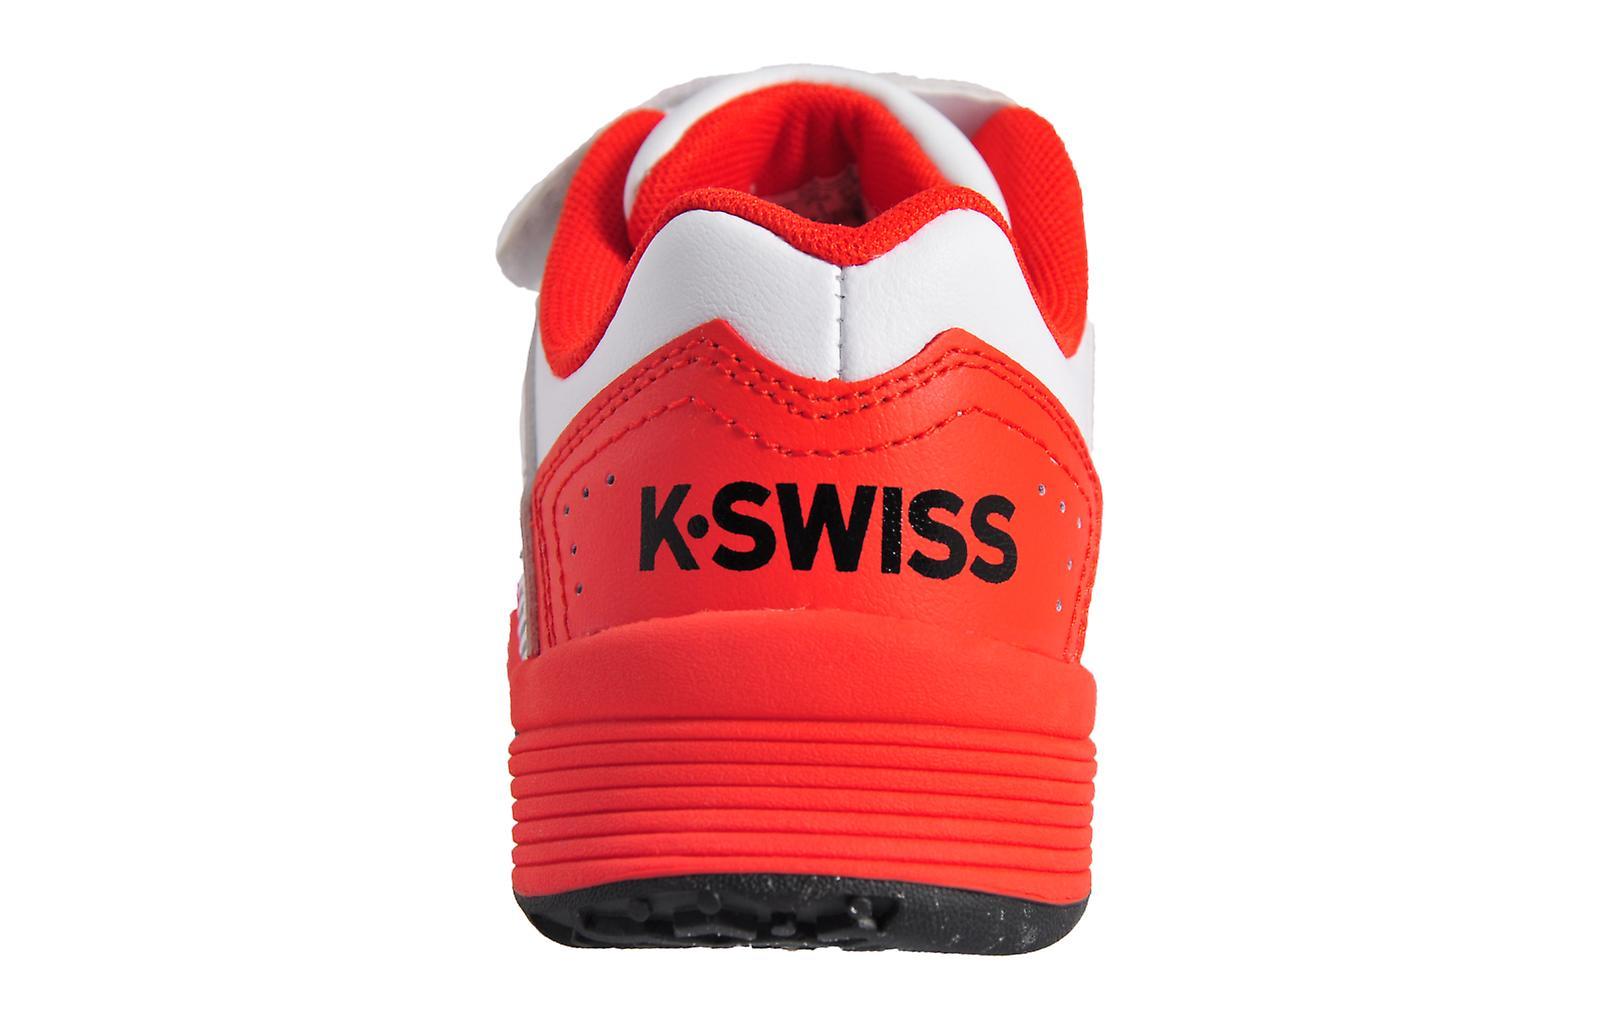 K Swiss Court Impact LTR Omni Strap Junior White / Fiery Red / Black